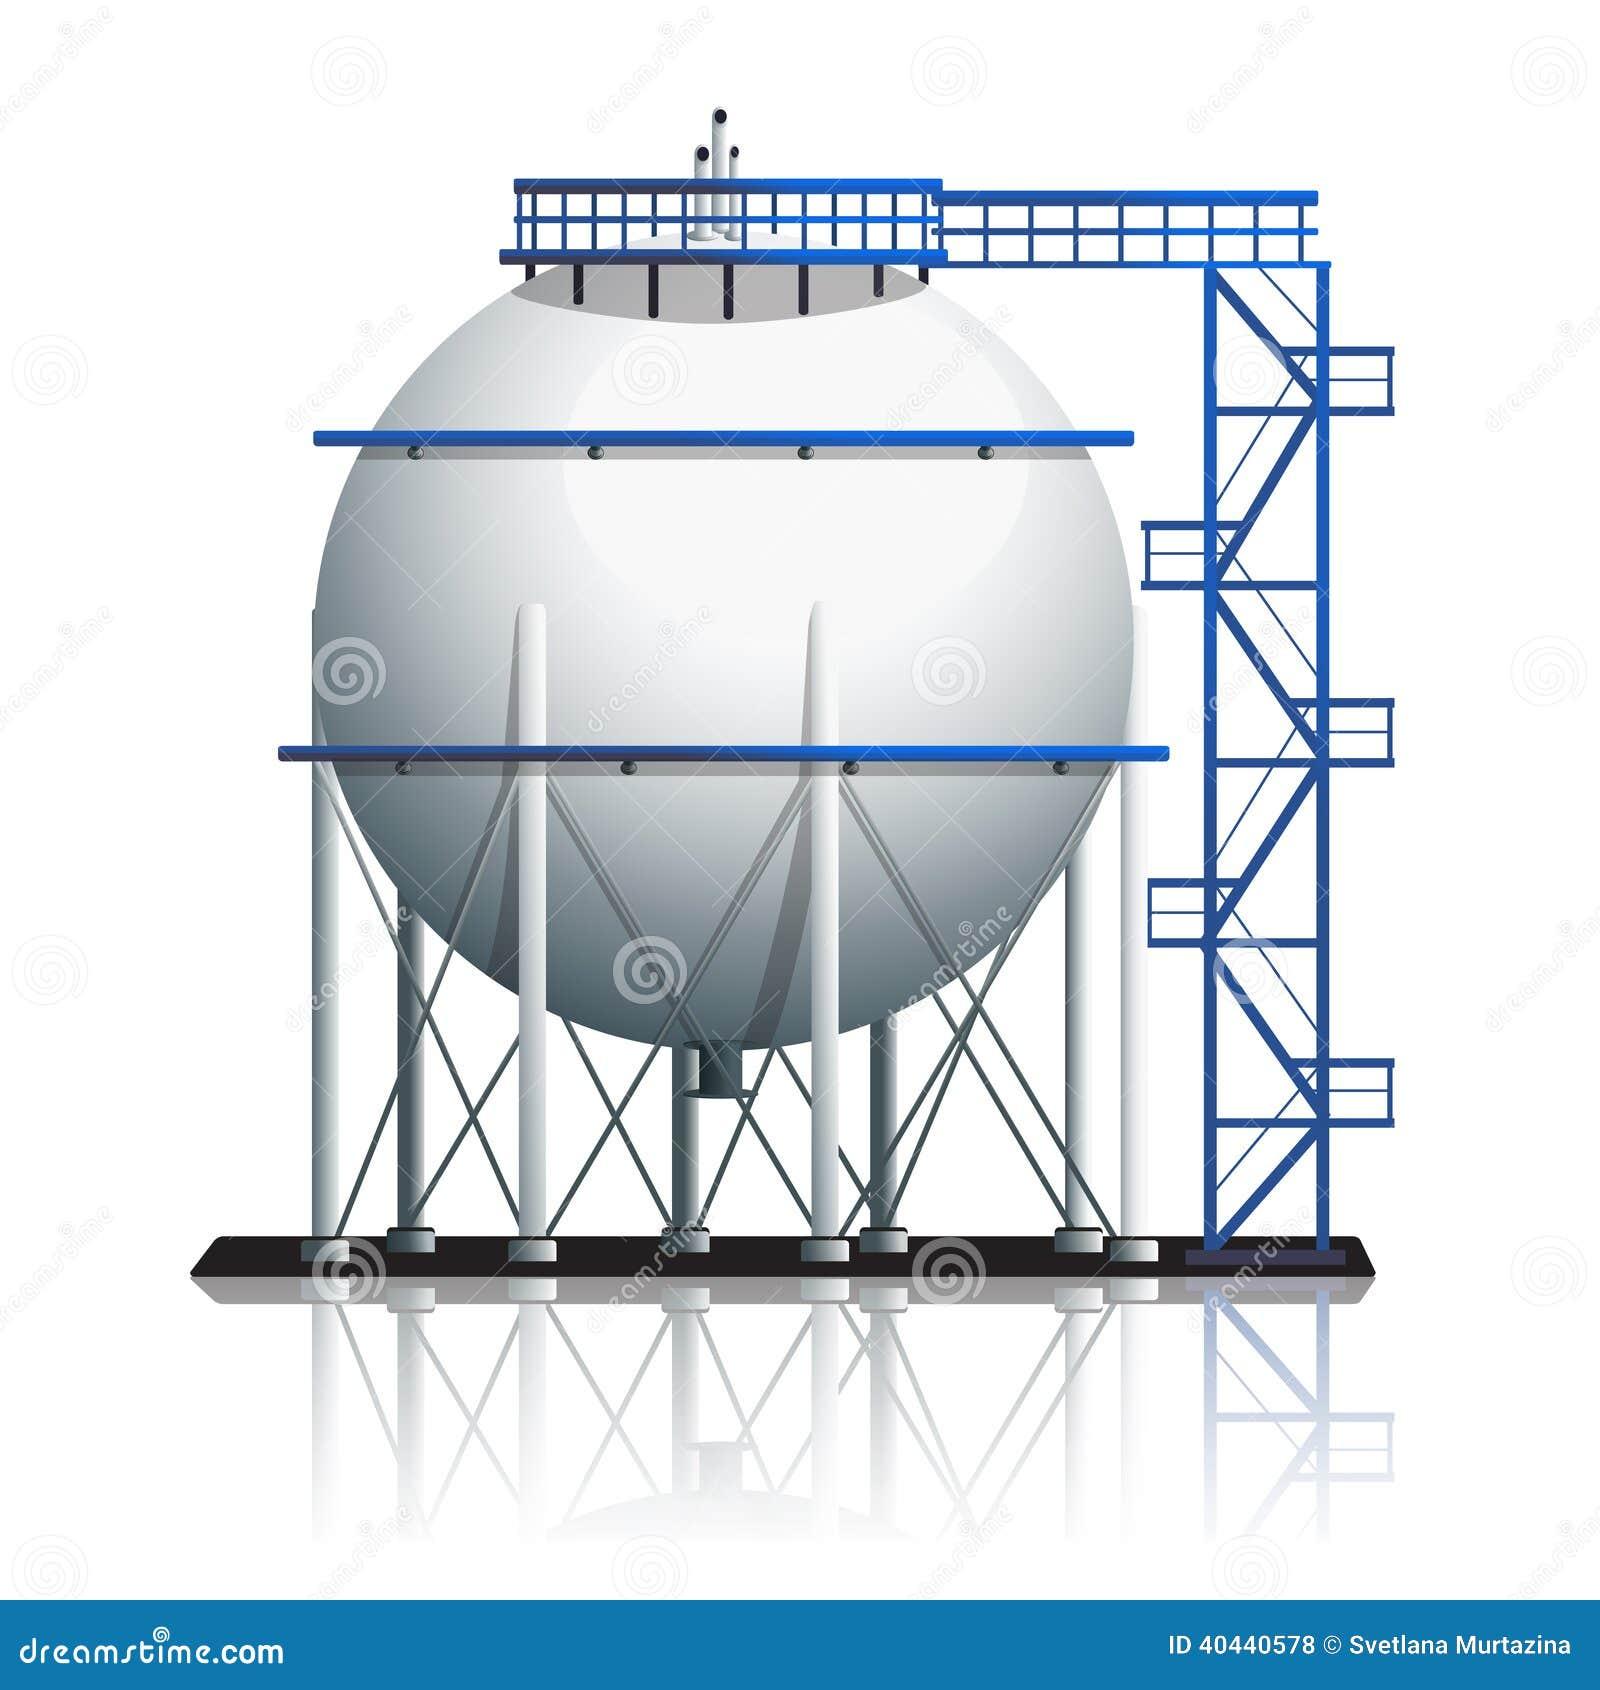 tank ball